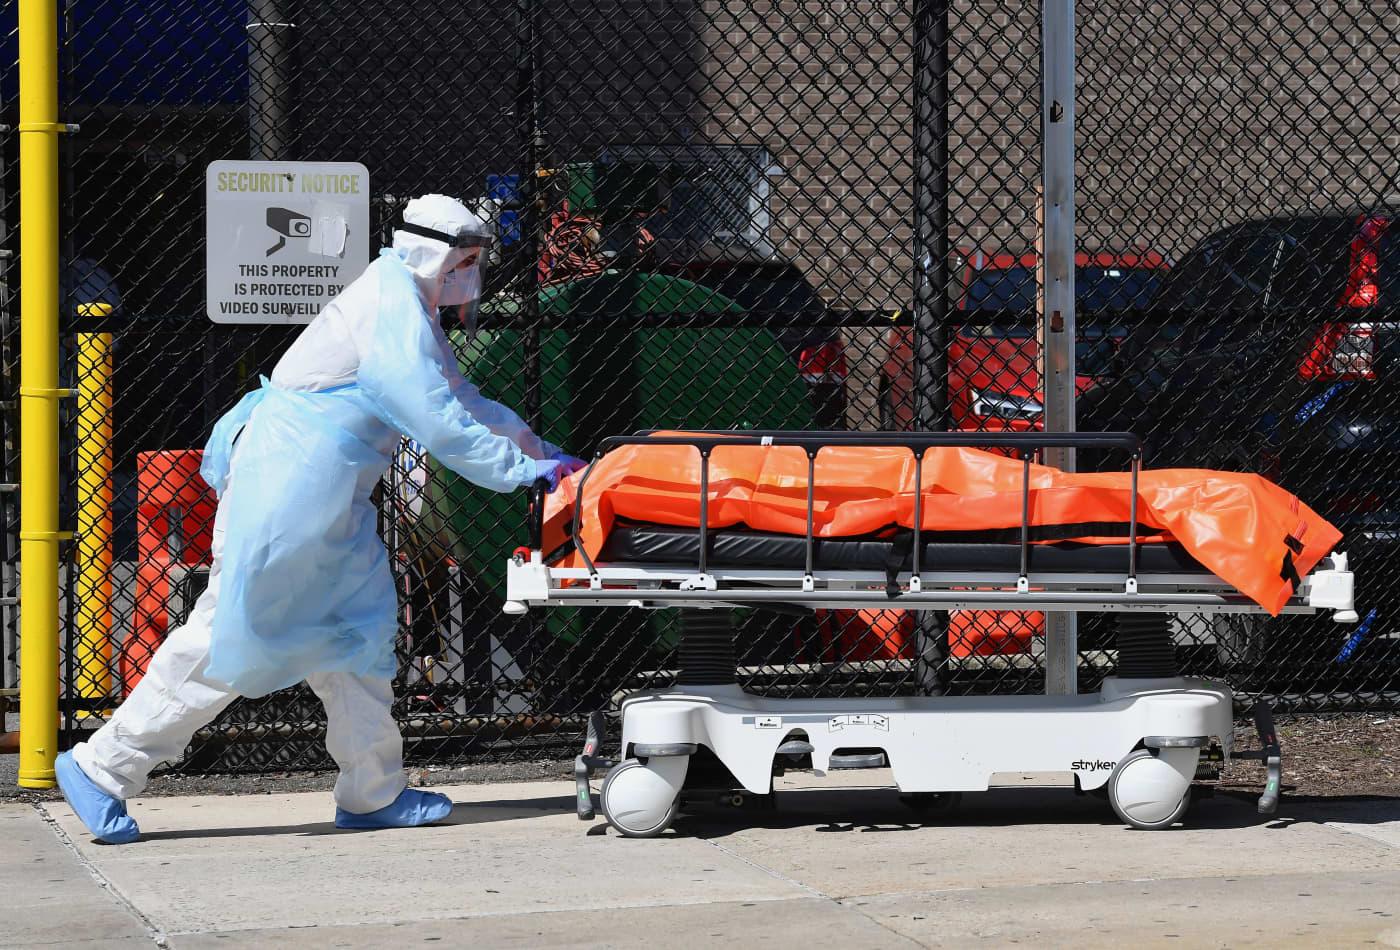 As U.S. coronavirus deaths cross 100,000, black Americans bear disproportionate share of fatalities